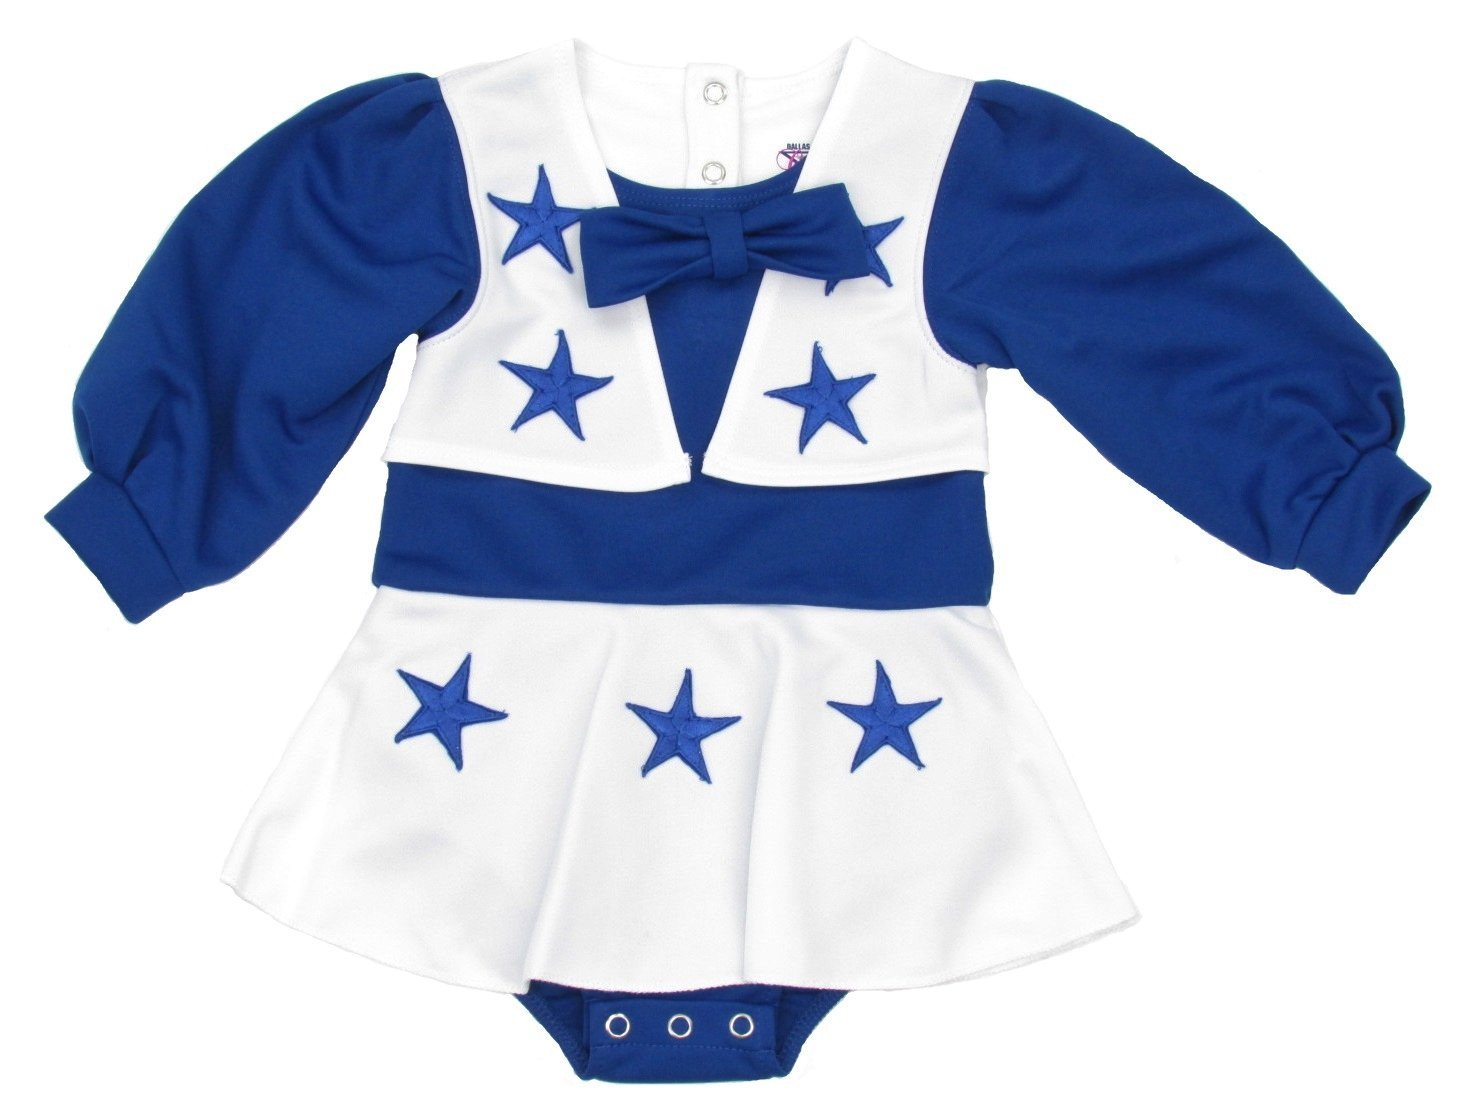 b6e99c7c9 Get Quotations · Dallas Cowboys Toddler One Piece Cheerleader Dress Uniform  - Blue White (12 Months)